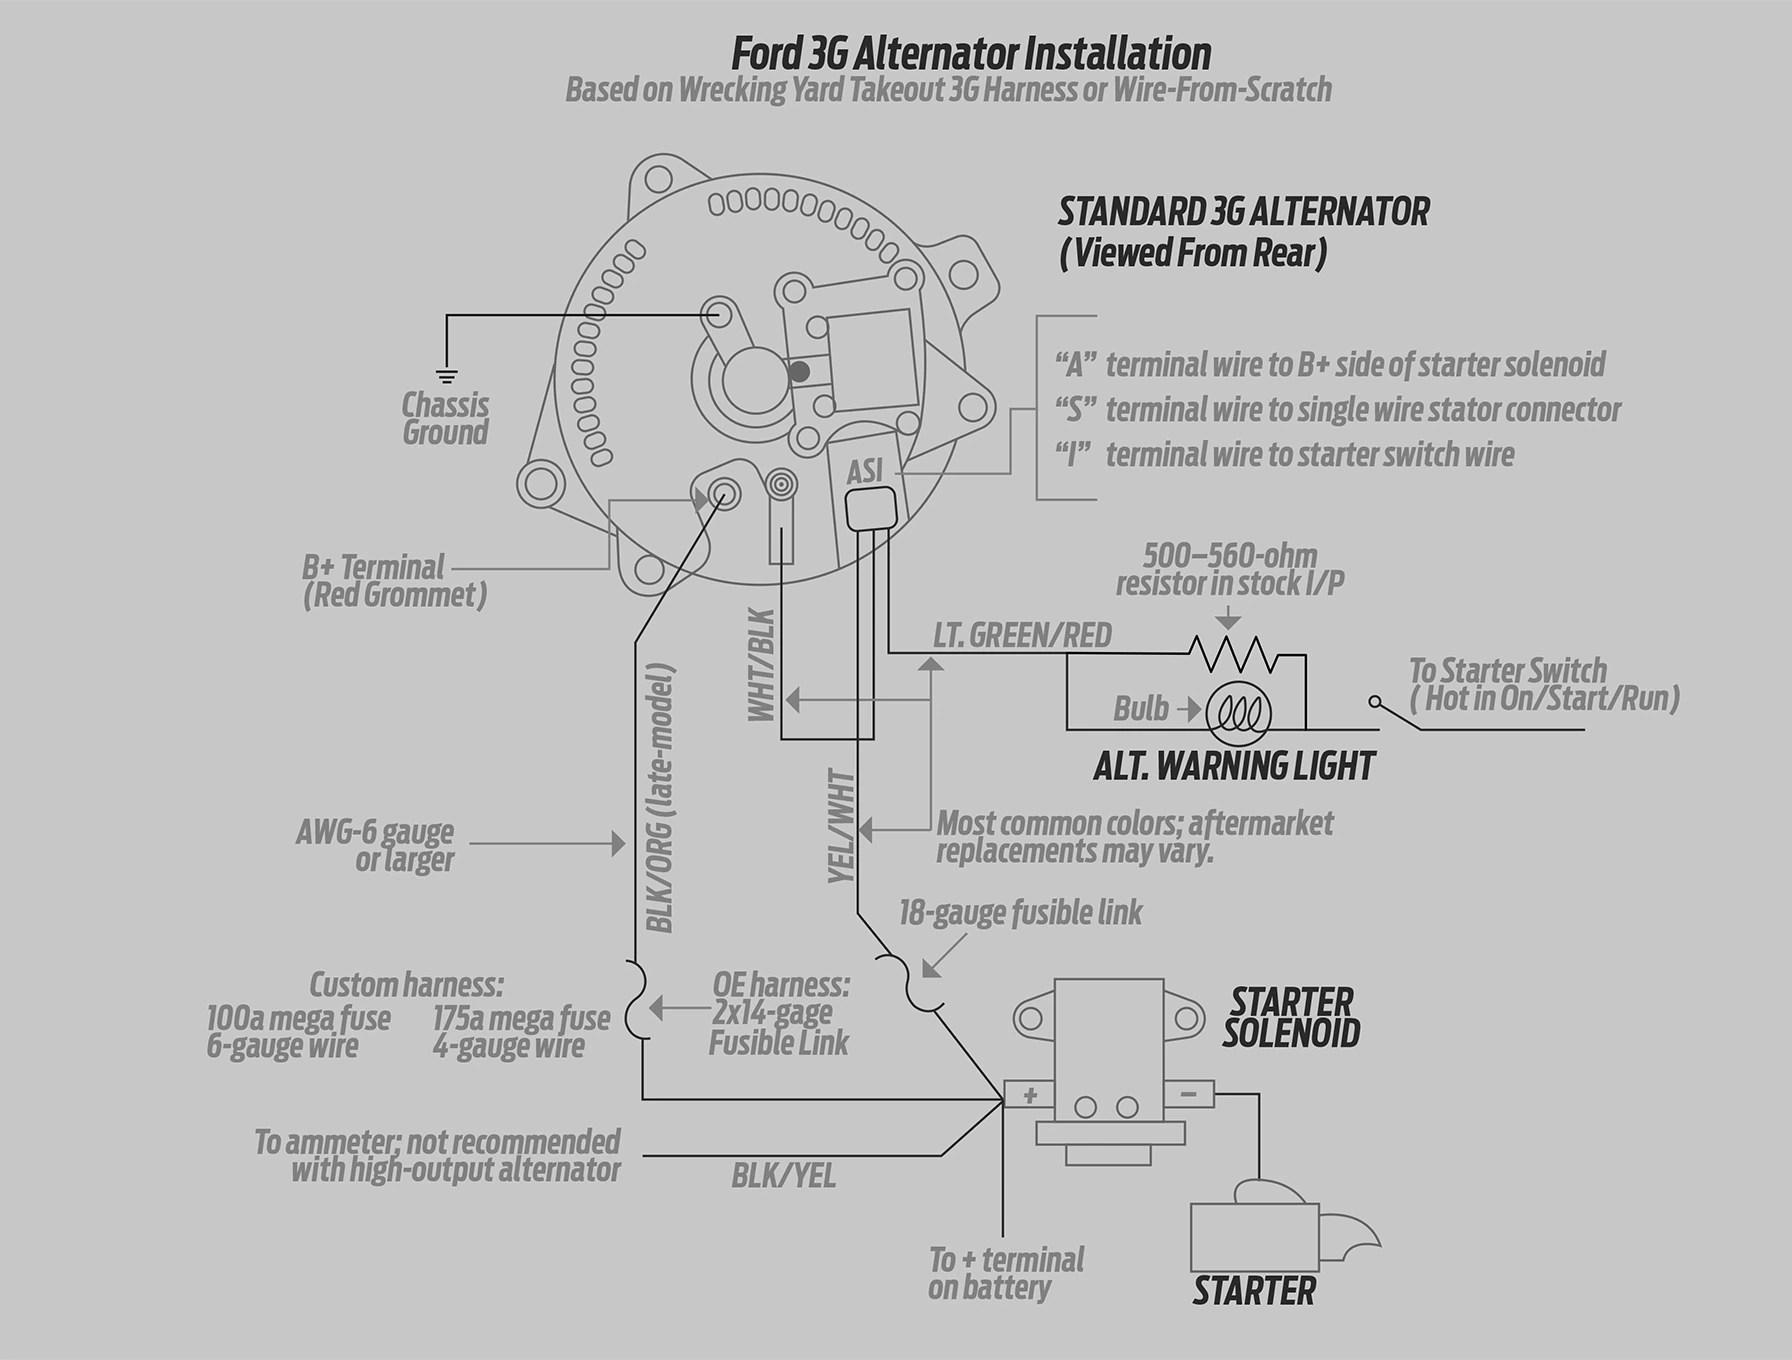 hight resolution of ford 3g alternator wiring harness wiring diagram toolboxford 3g alternator wiring wiring diagram details ford 3g